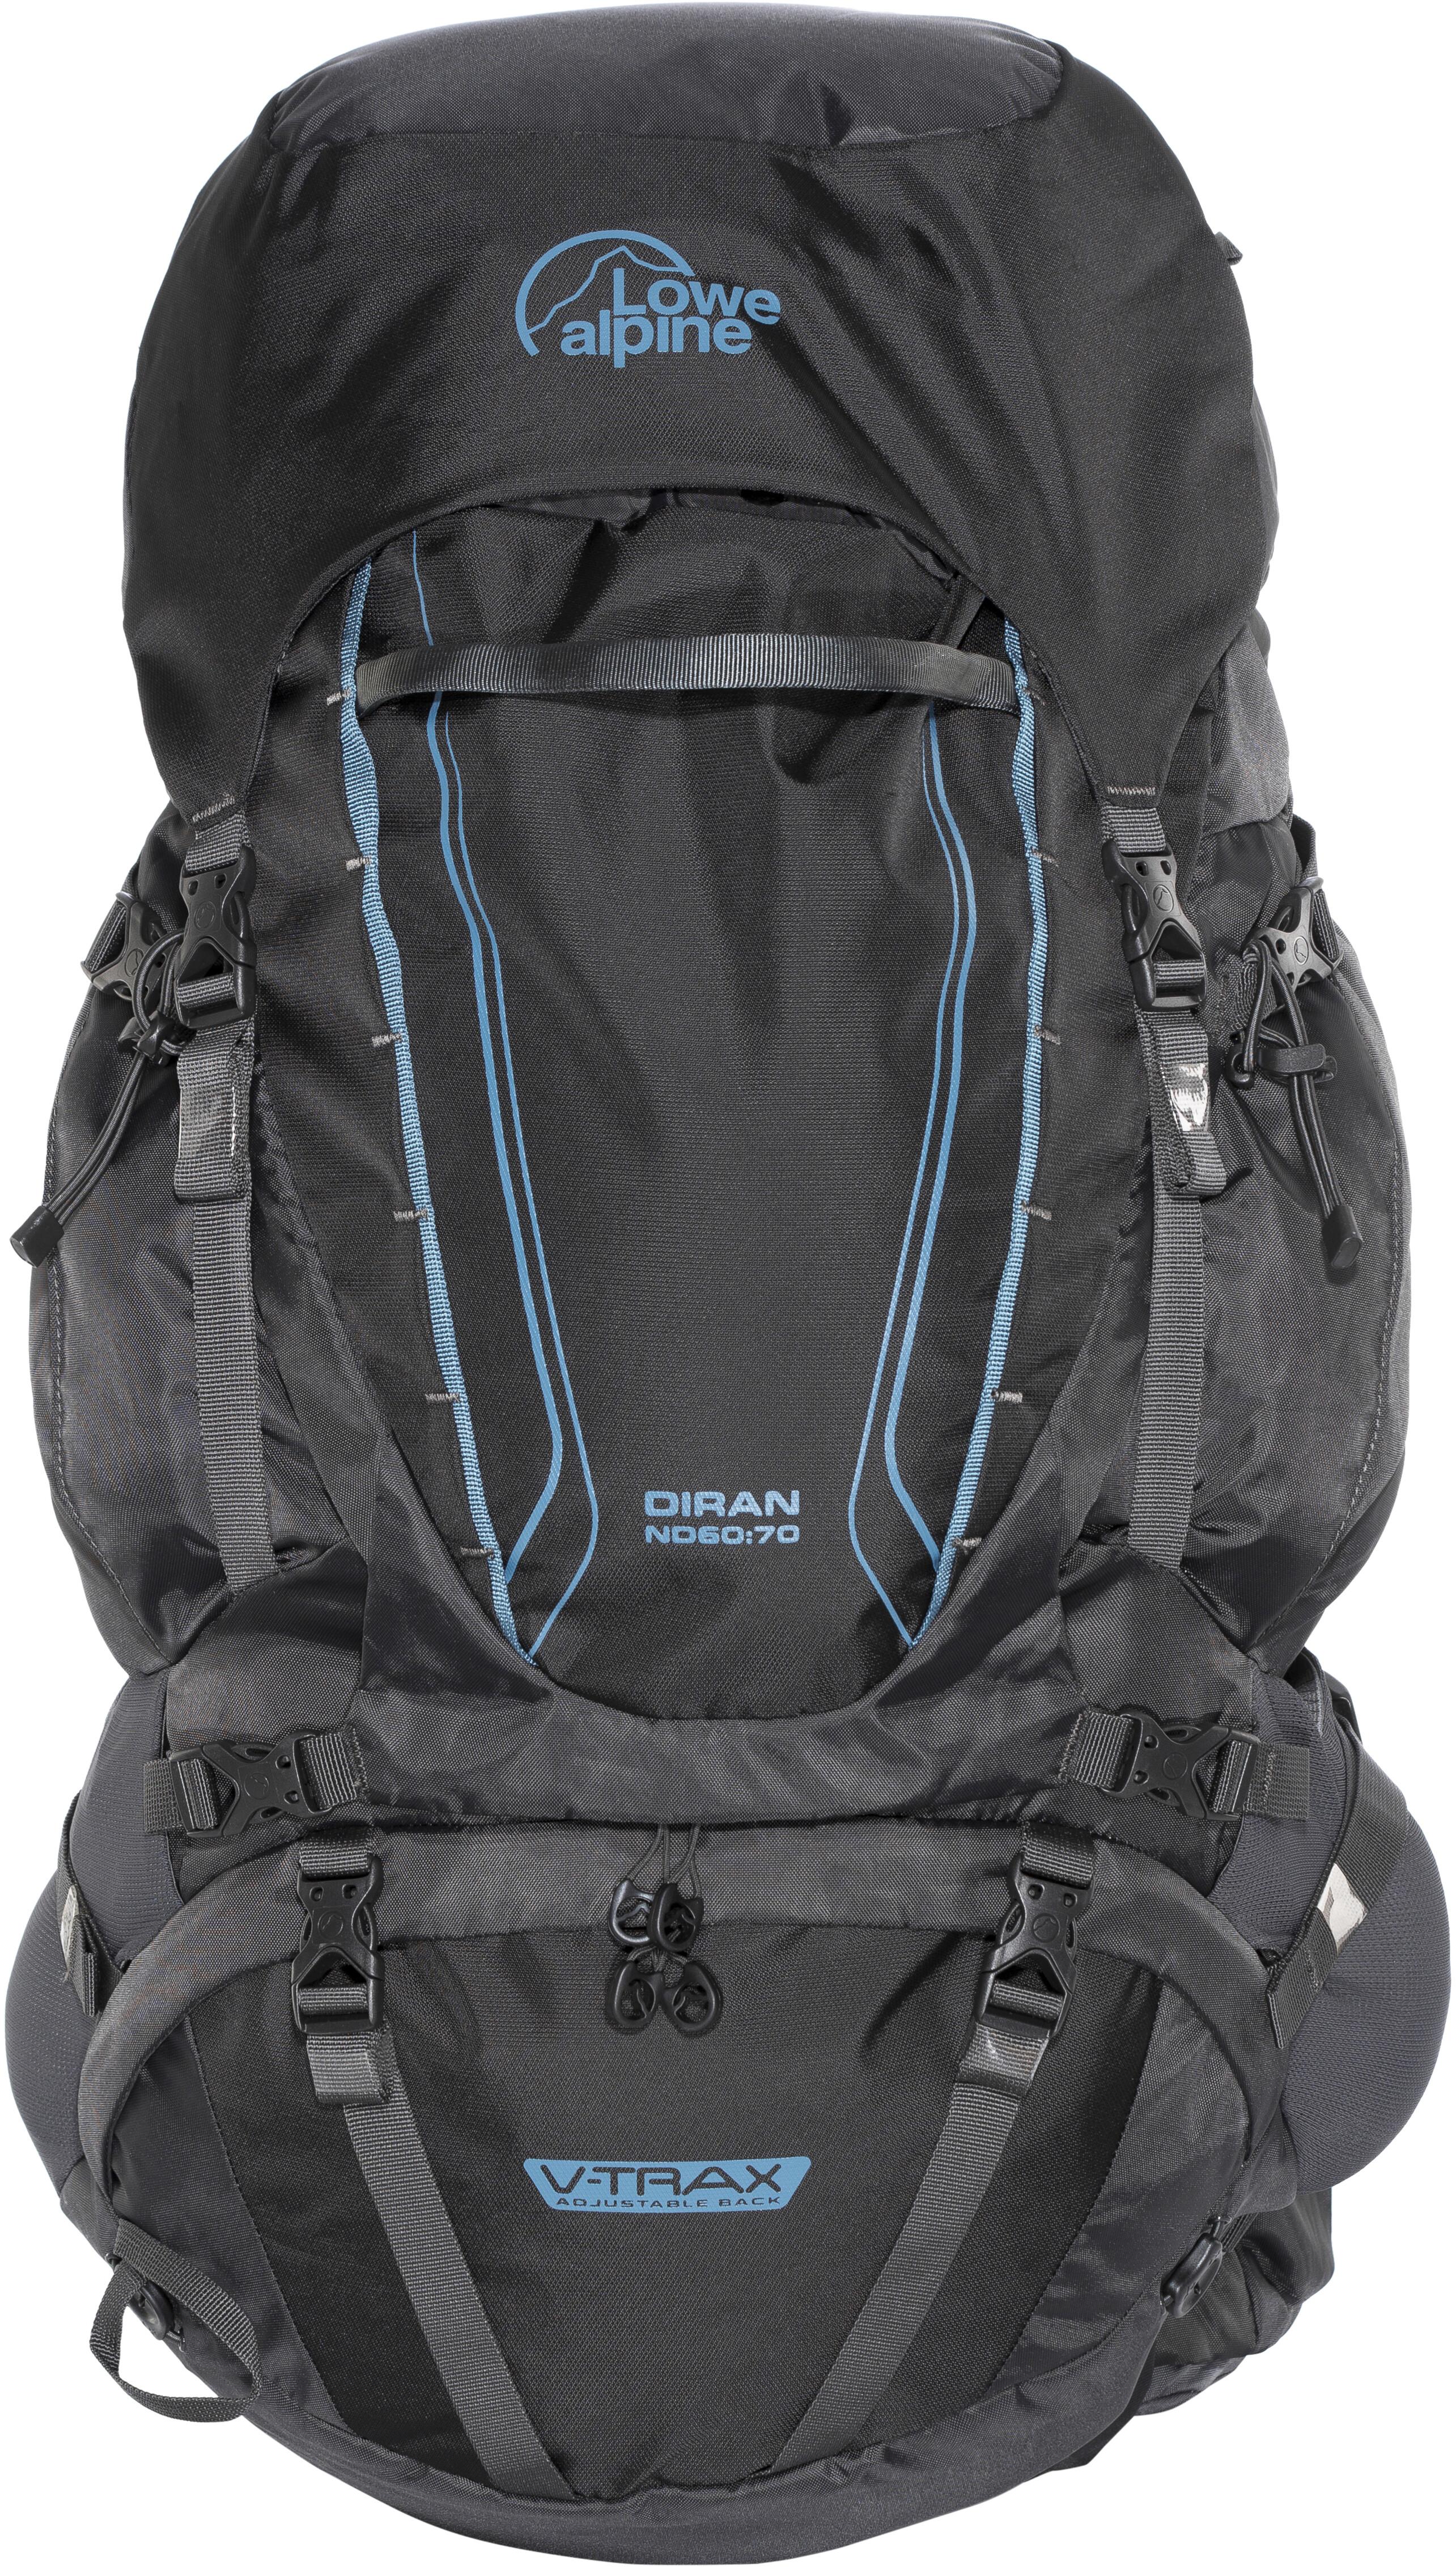 d912ac24b1c Lowe Alpine Diran ND60:70 Backpack Women black at Addnature.co.uk